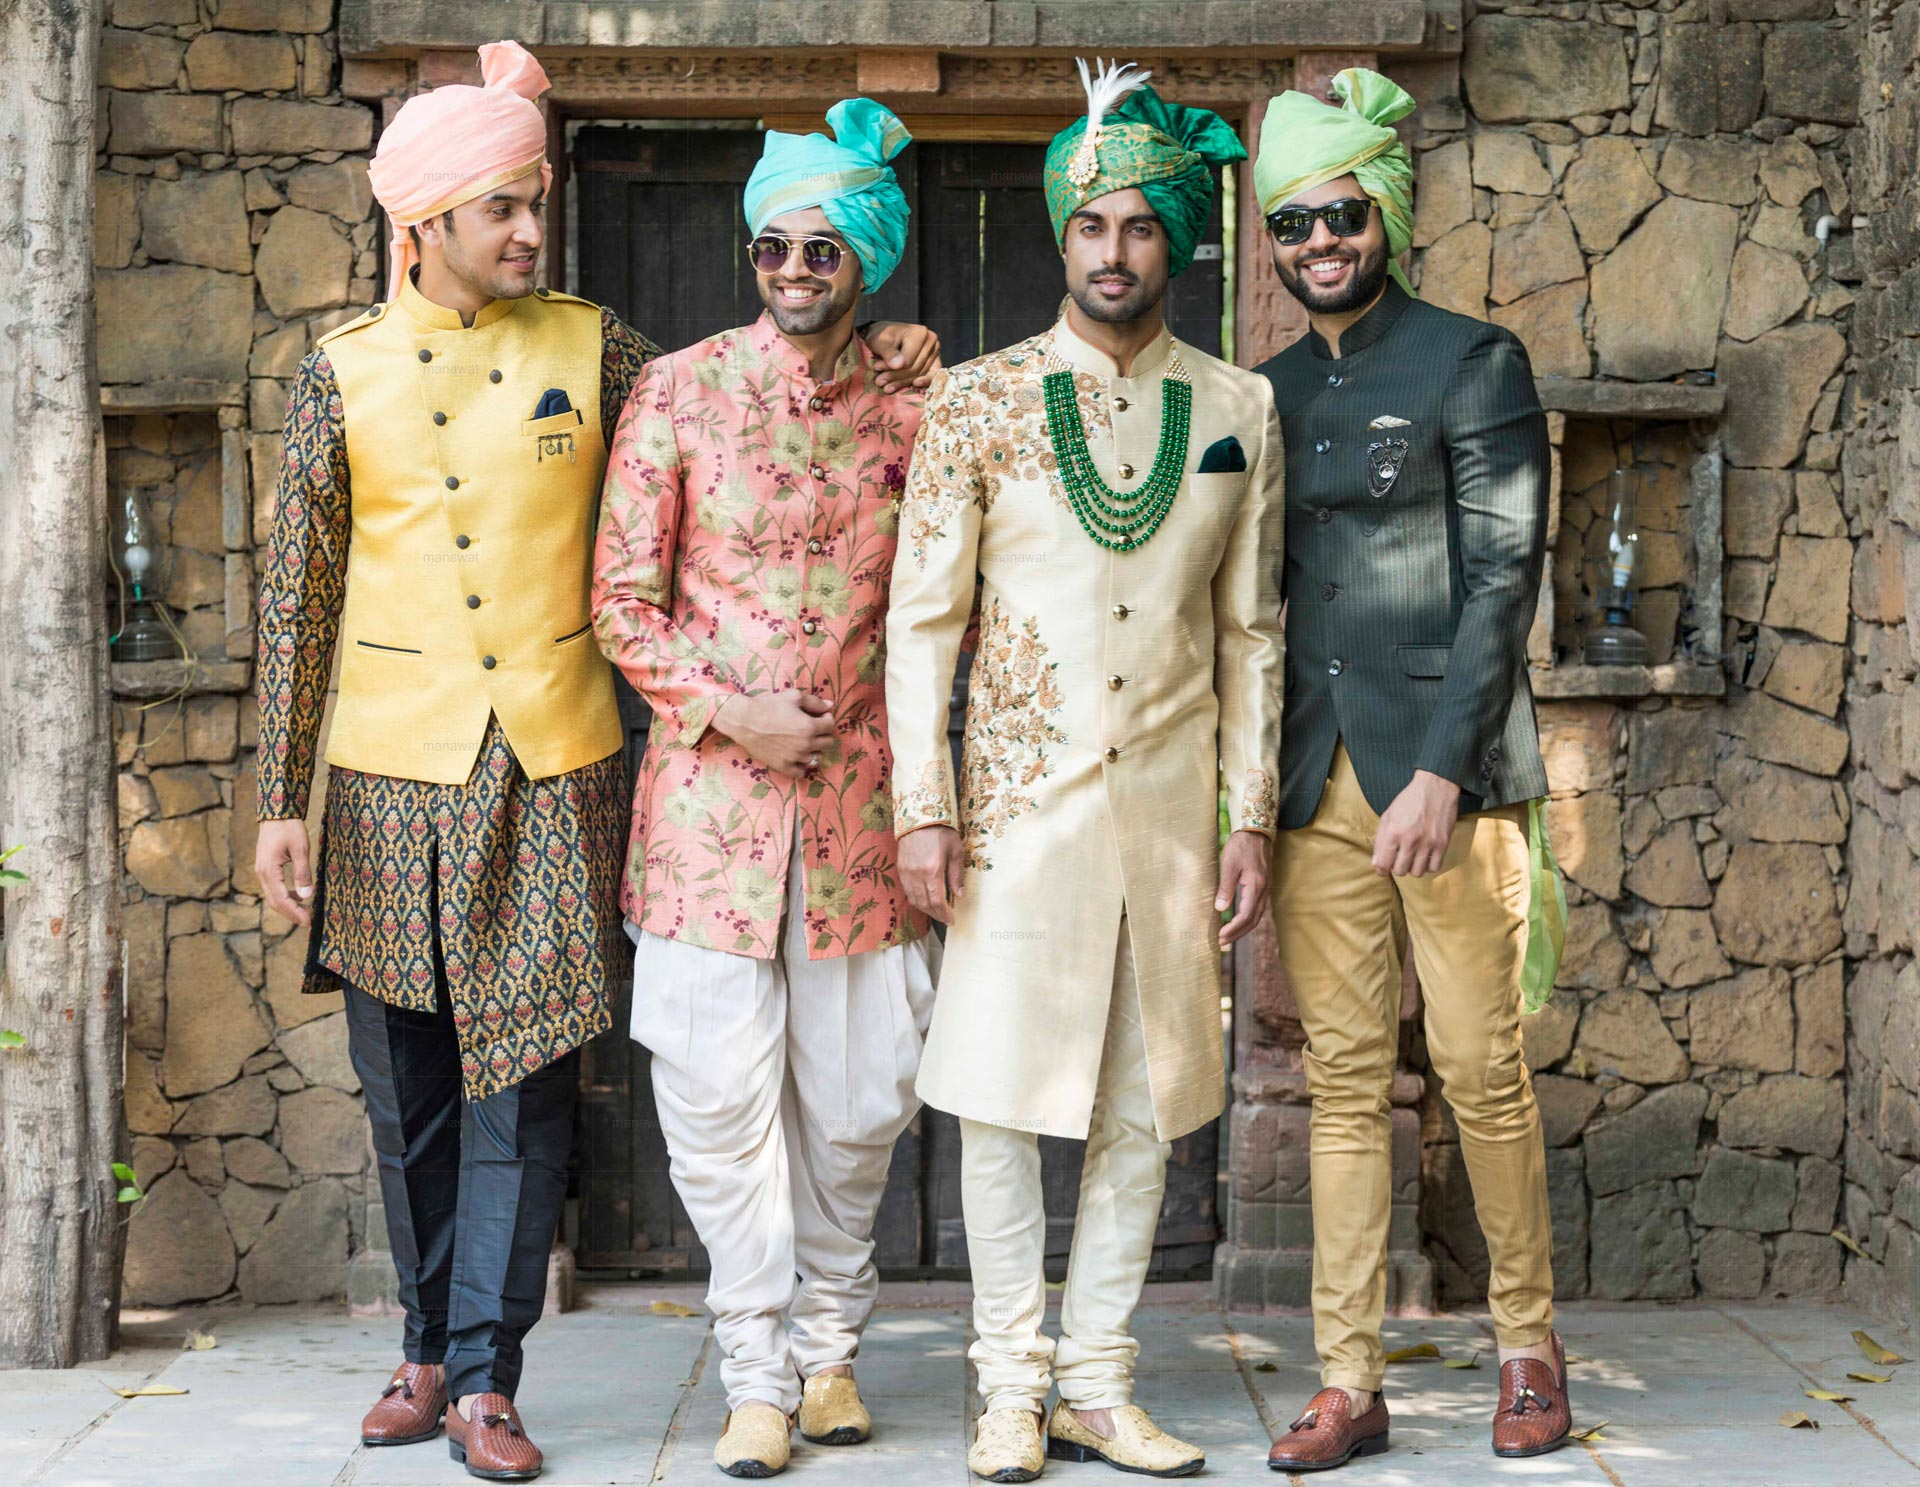 Indian Groom Outfits - Kurta Pajama